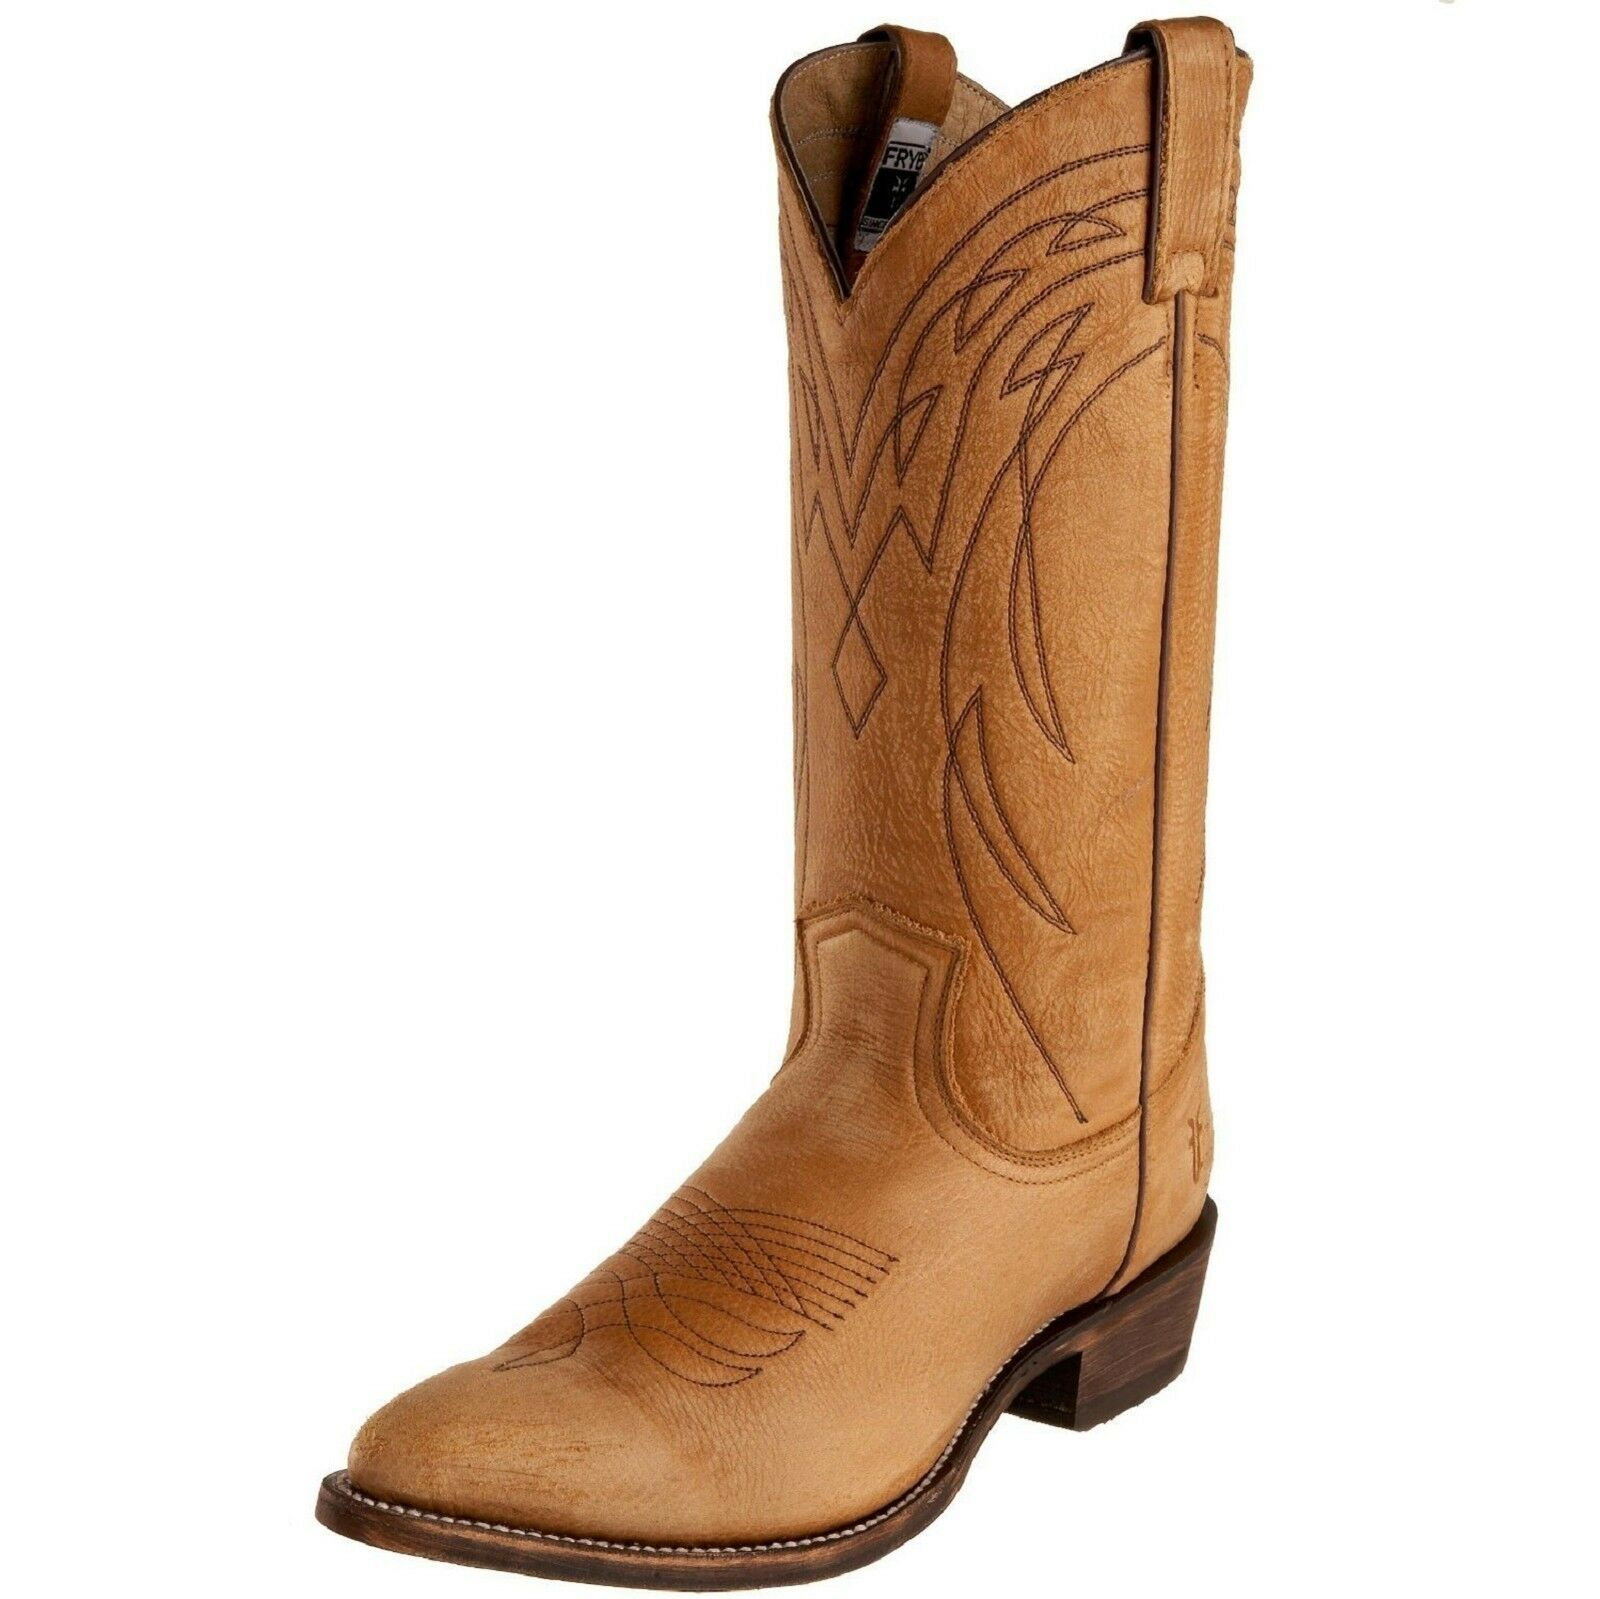 Frye BILLY TALL Cowboy Western Leather Boots  77800 Light Tan 6 Women Knee New